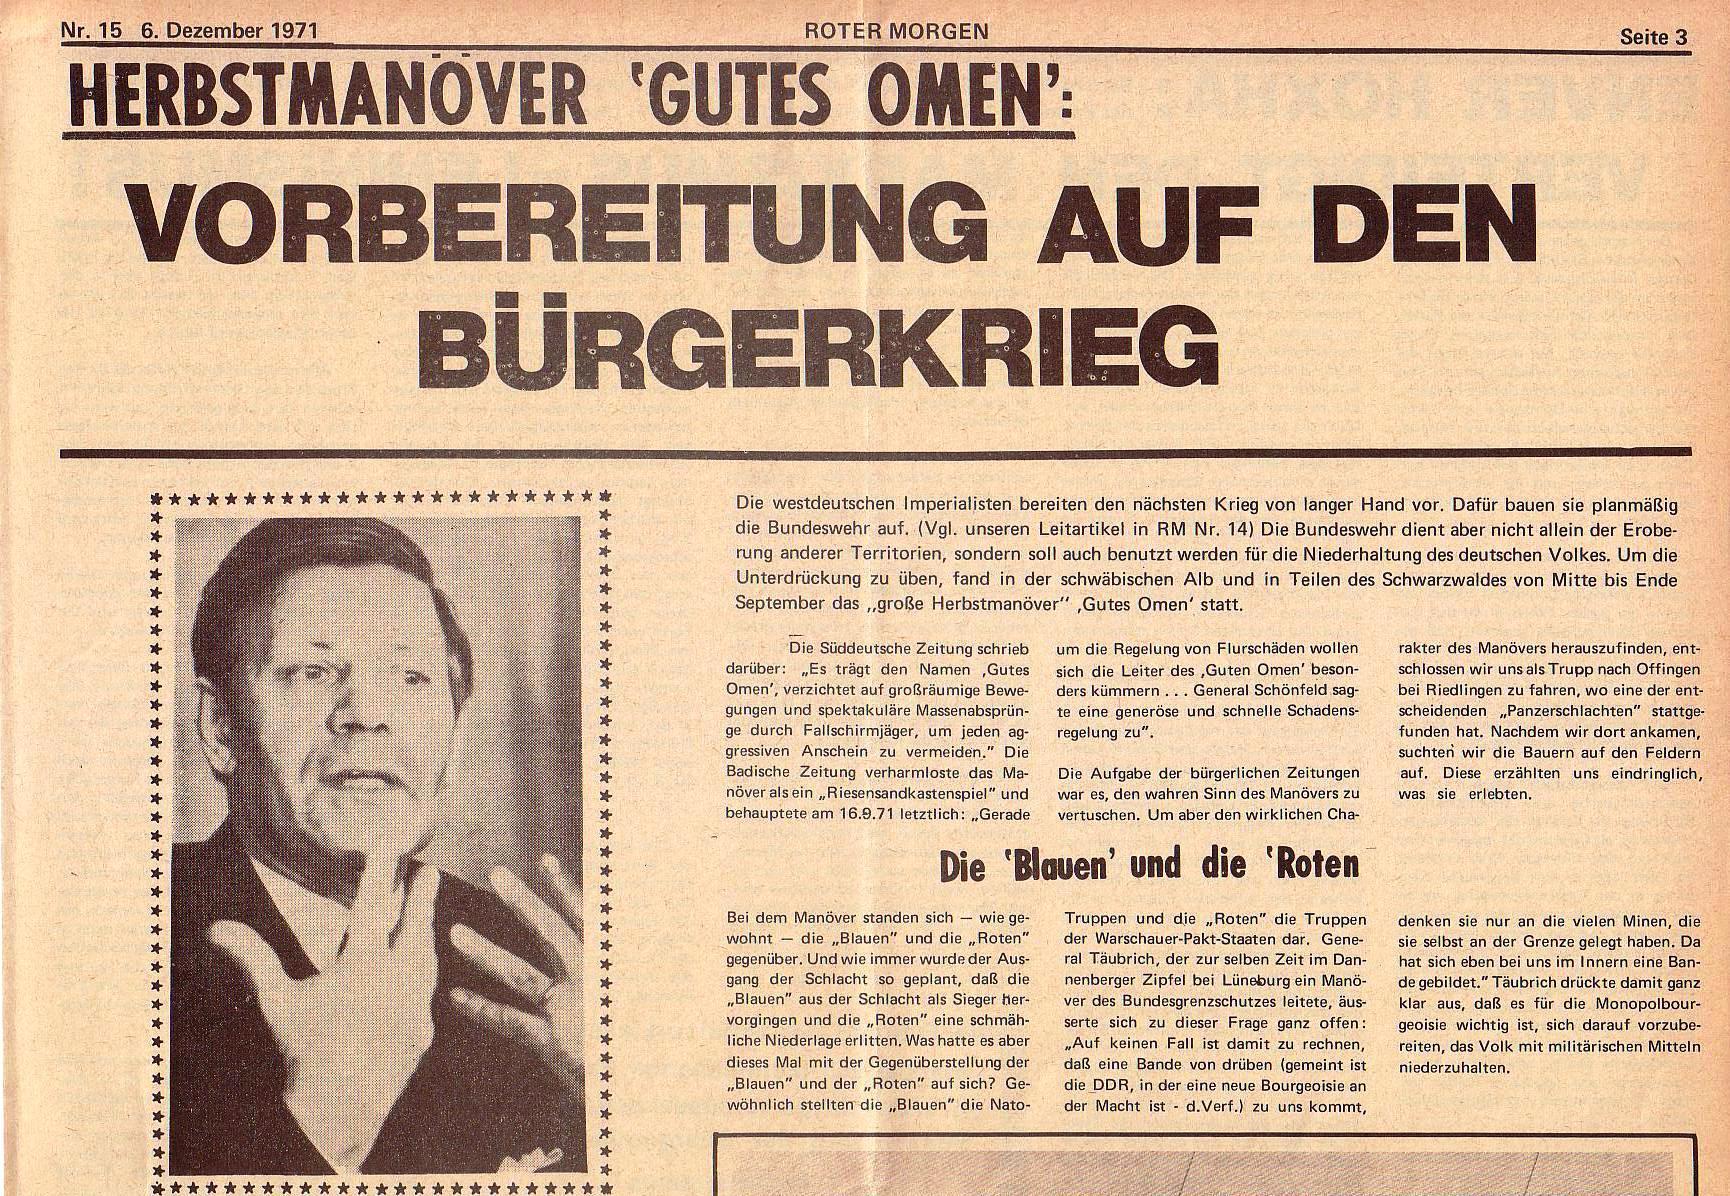 Roter Morgen, 5. Jg., 6. Dezember 1971, Nr. 15, Seite 3a